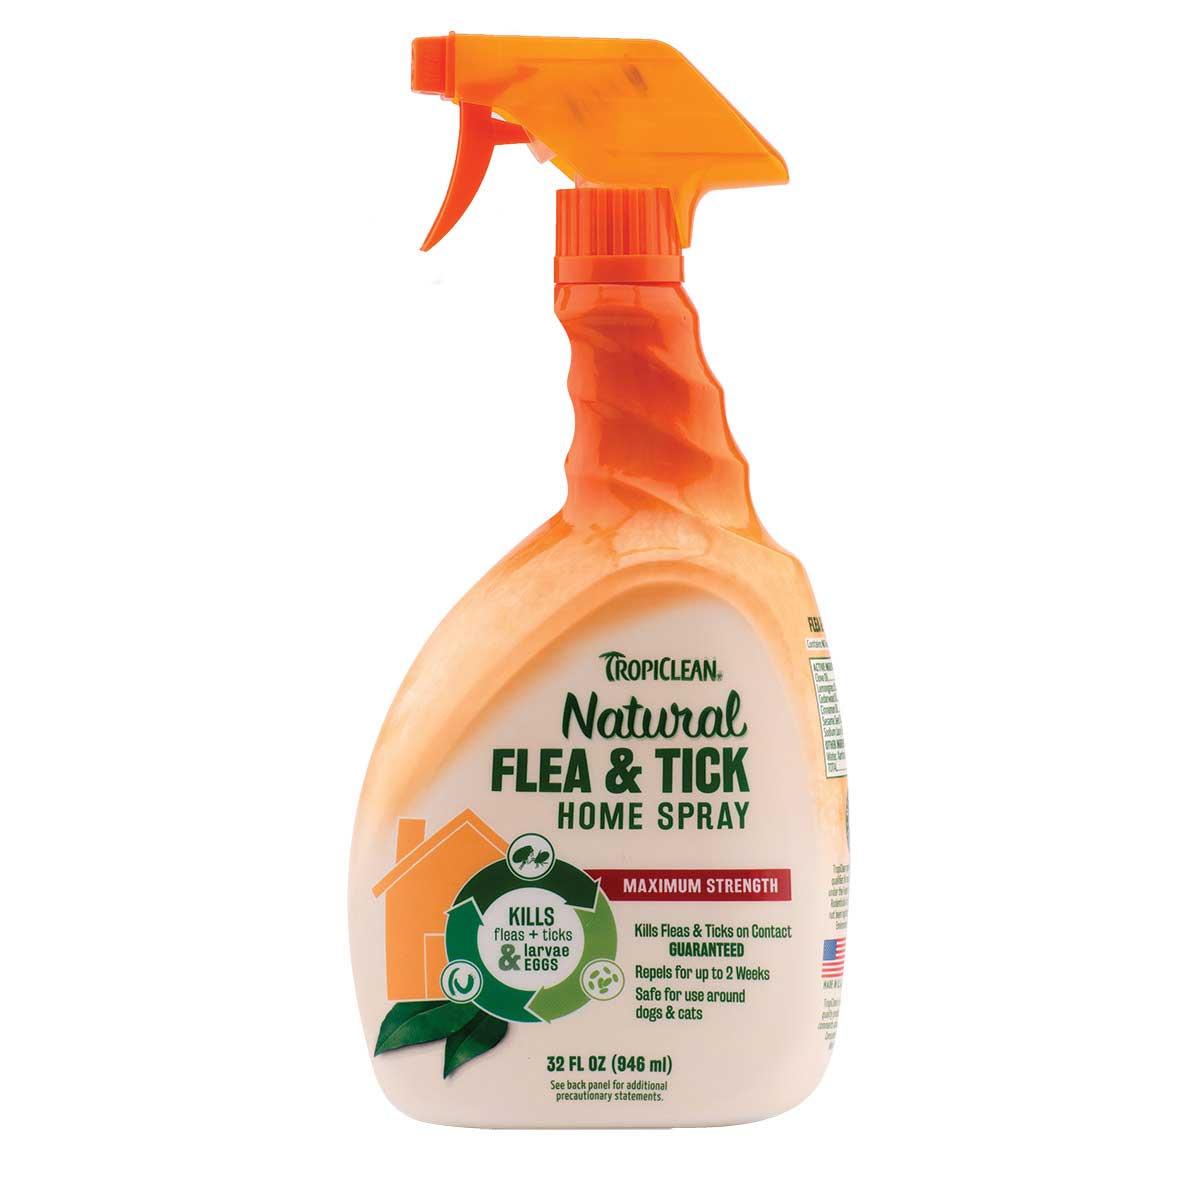 Tropiclean Flea & Tick Spray For Home - Maximum Strength 32 oz